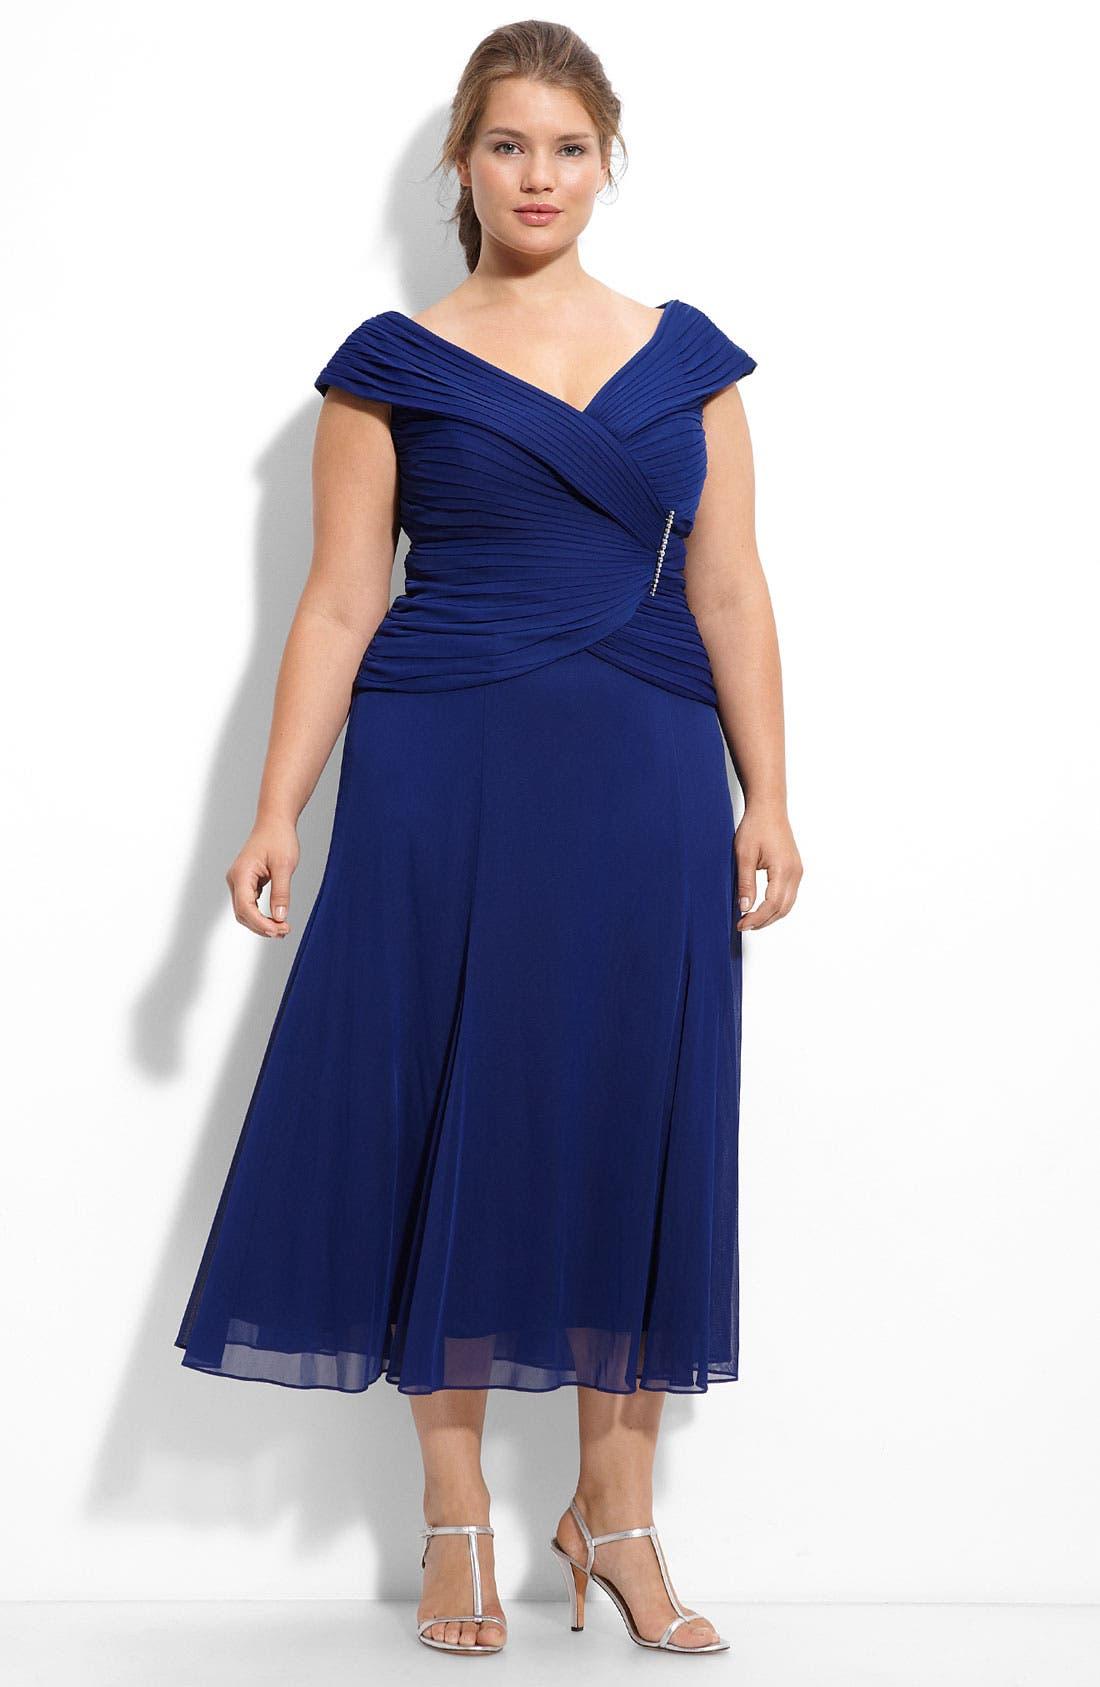 Alternate Image 1 Selected - Alex Evenings Jeweled Portrait Collar Mesh Dress (Plus)